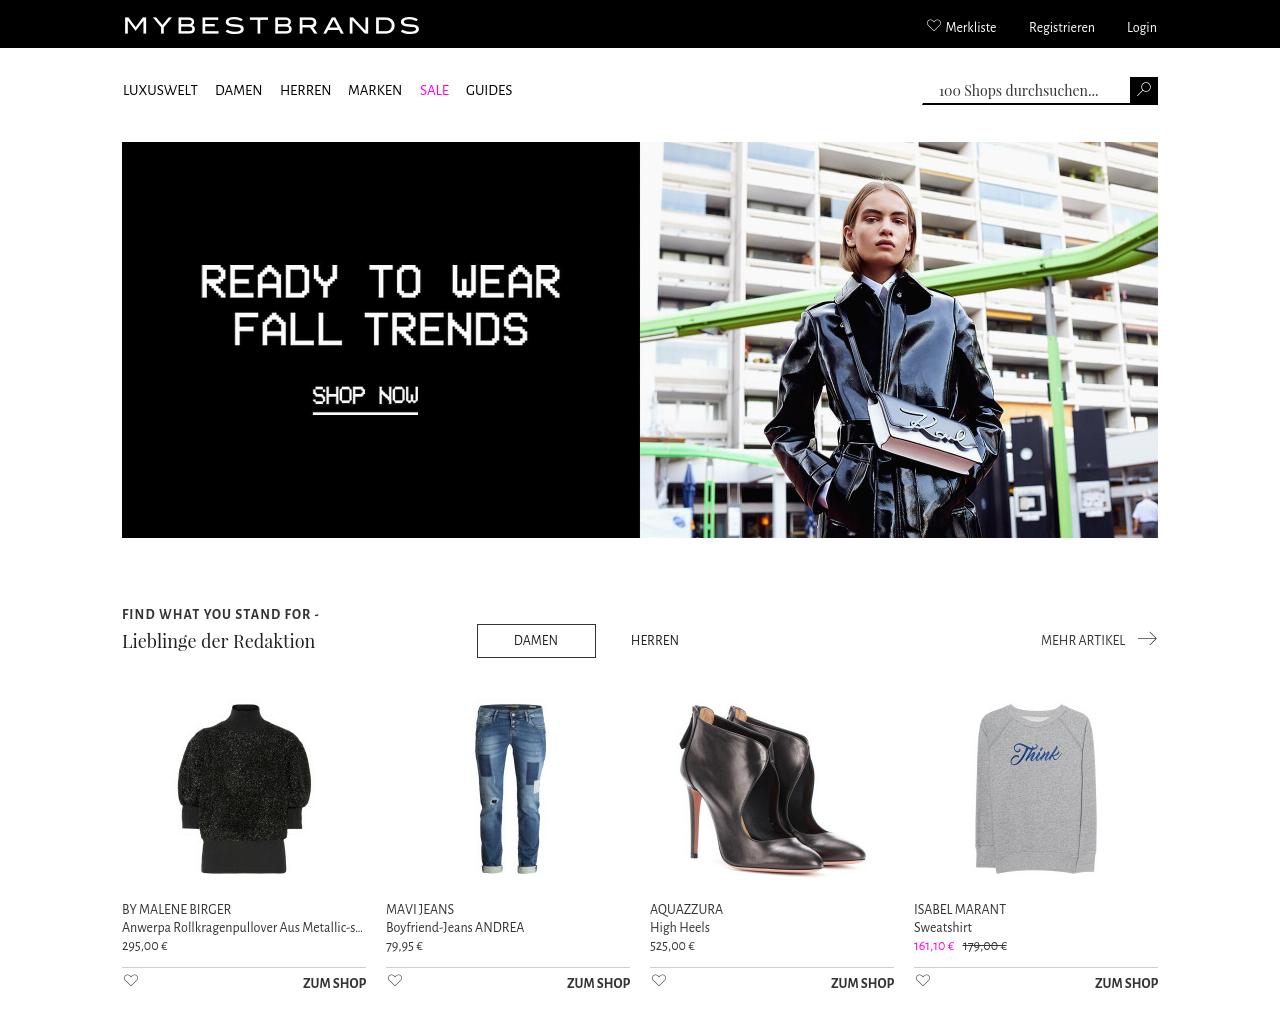 mybestbrands-Advertising-Reviews-Pricing